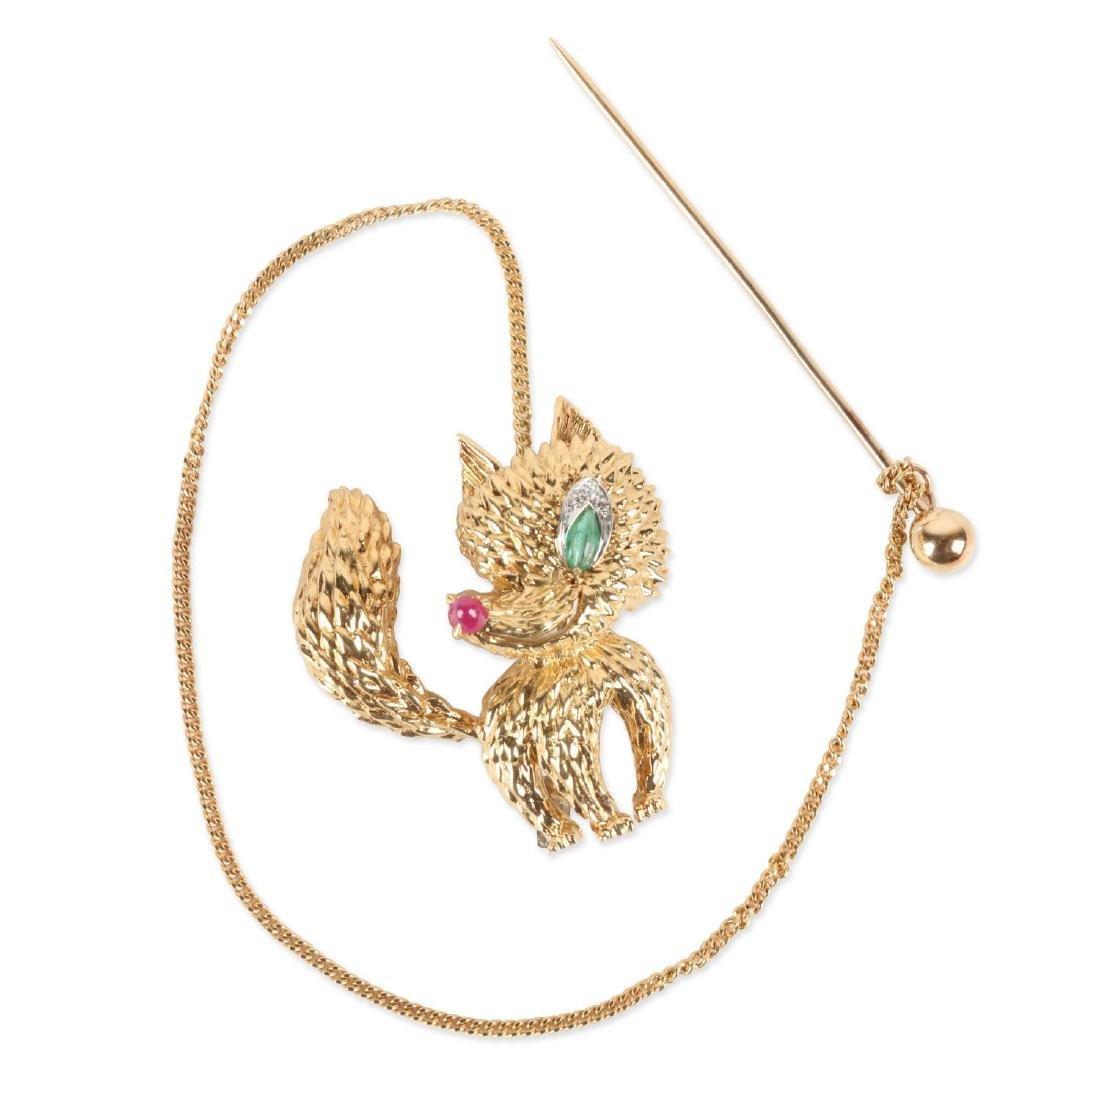 "Cartier, 18K, Ruby, Diamond & Emerald ""Fox"" Brooch"